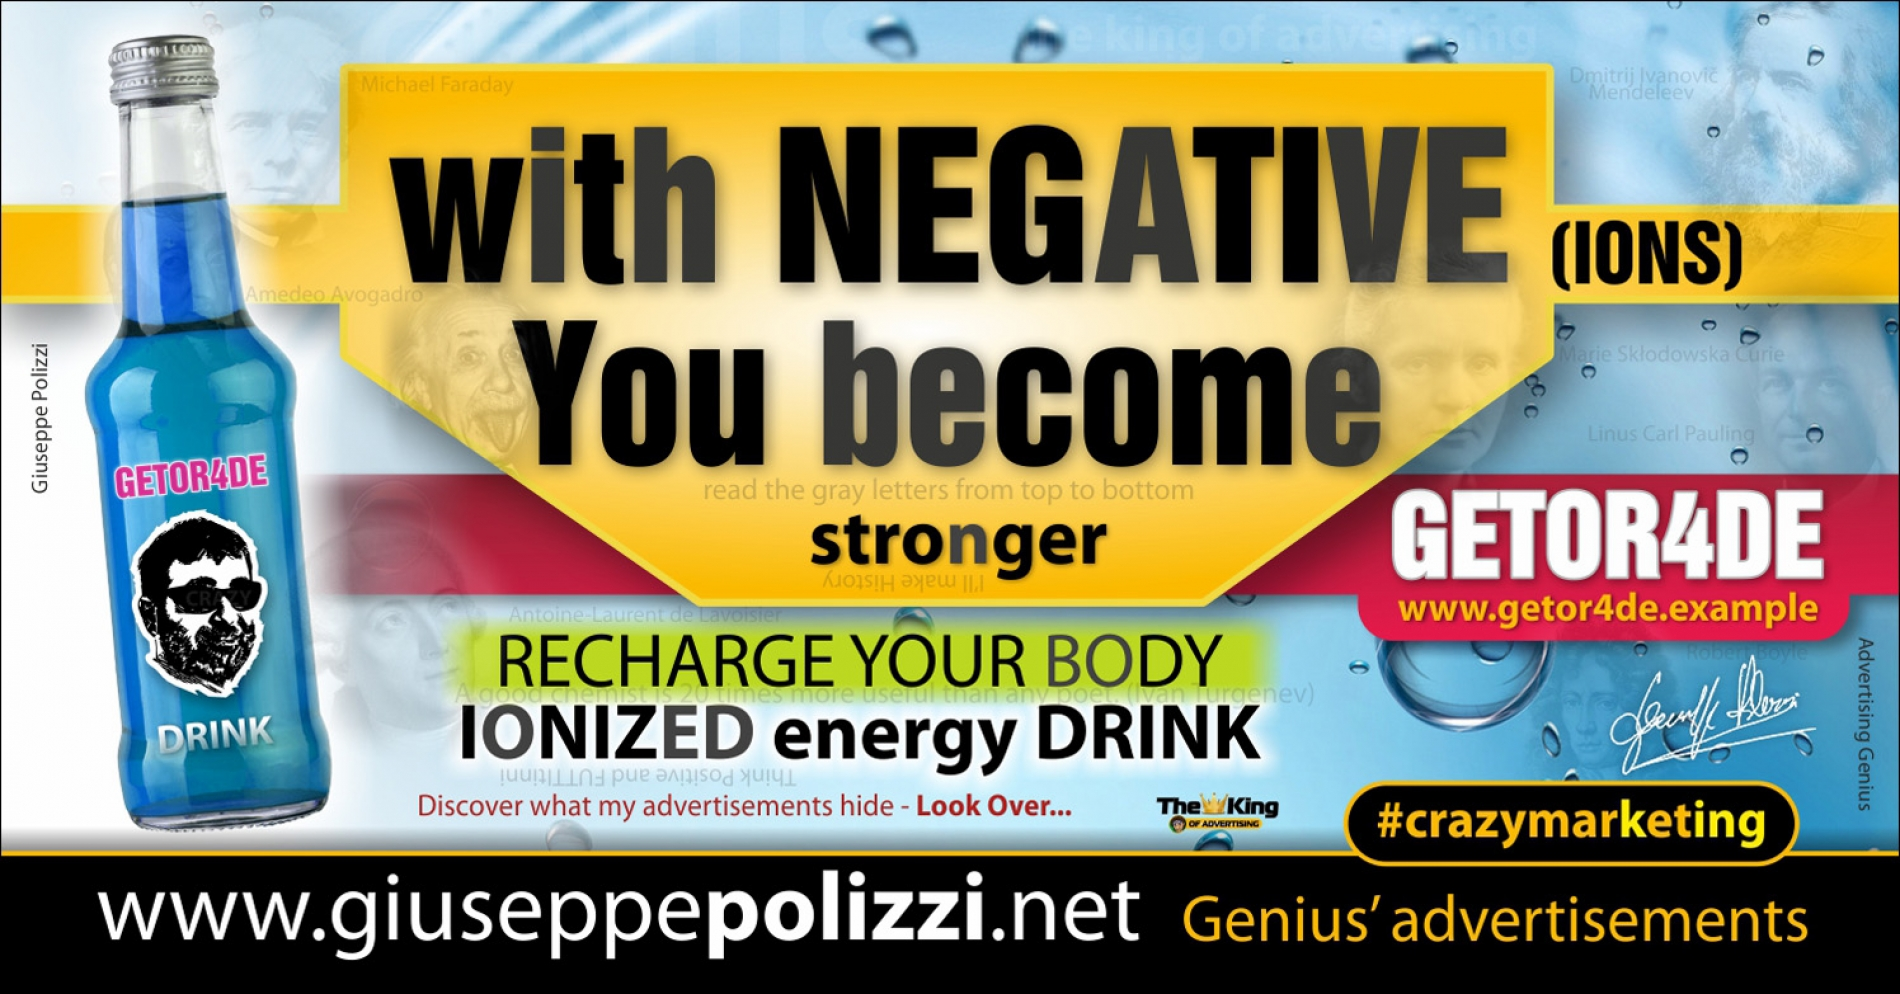 giuseppe Polizzi  With NEGATIVE you BECOME  crazymarketing genius ing